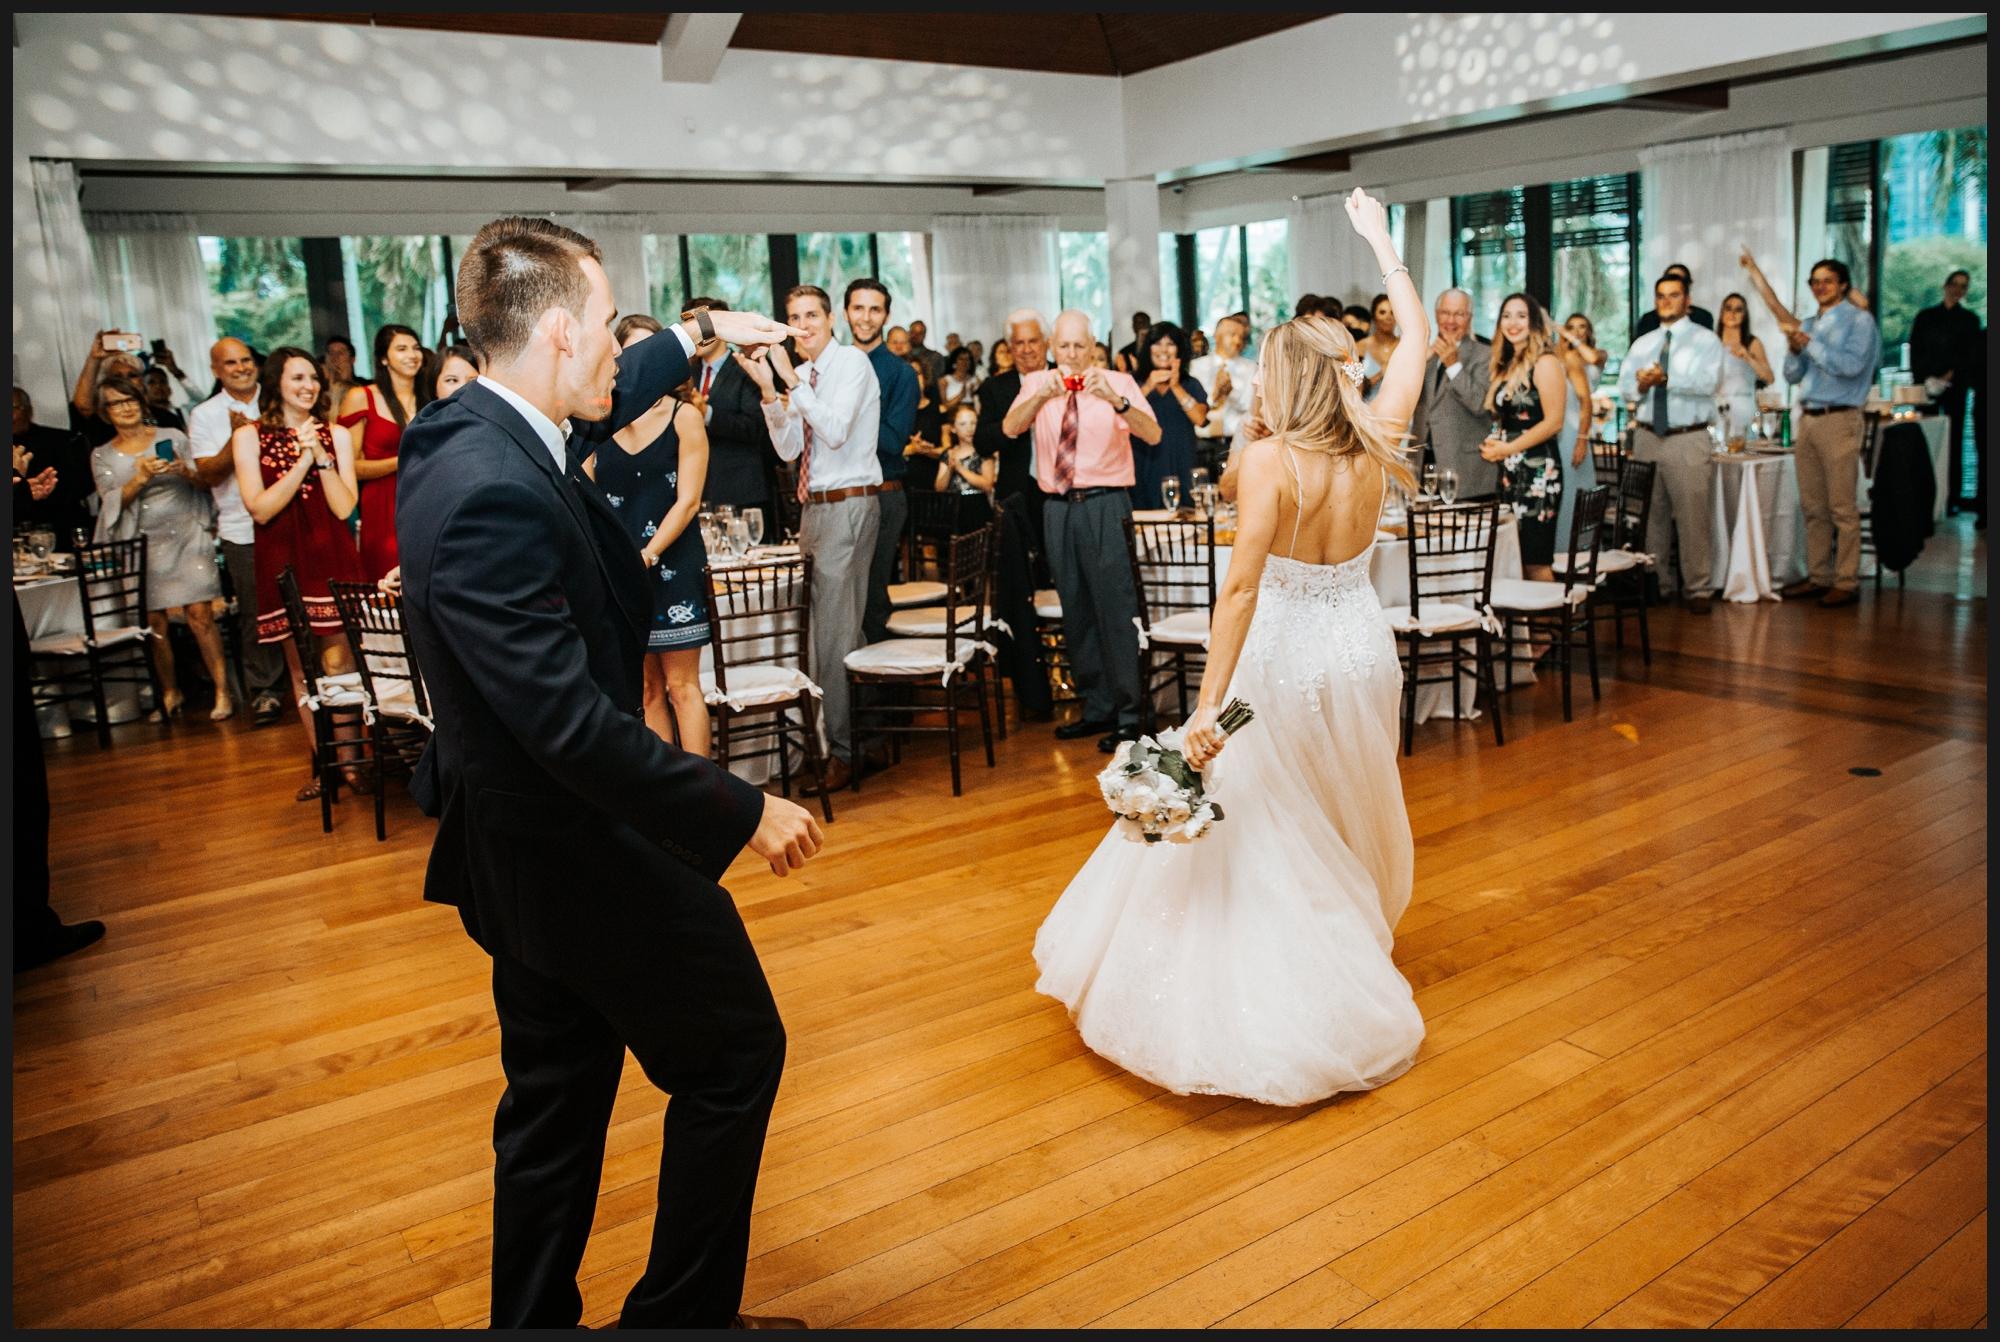 Orlando-Wedding-Photographer-destination-wedding-photographer-florida-wedding-photographer-bohemian-wedding-photographer_0109.jpg